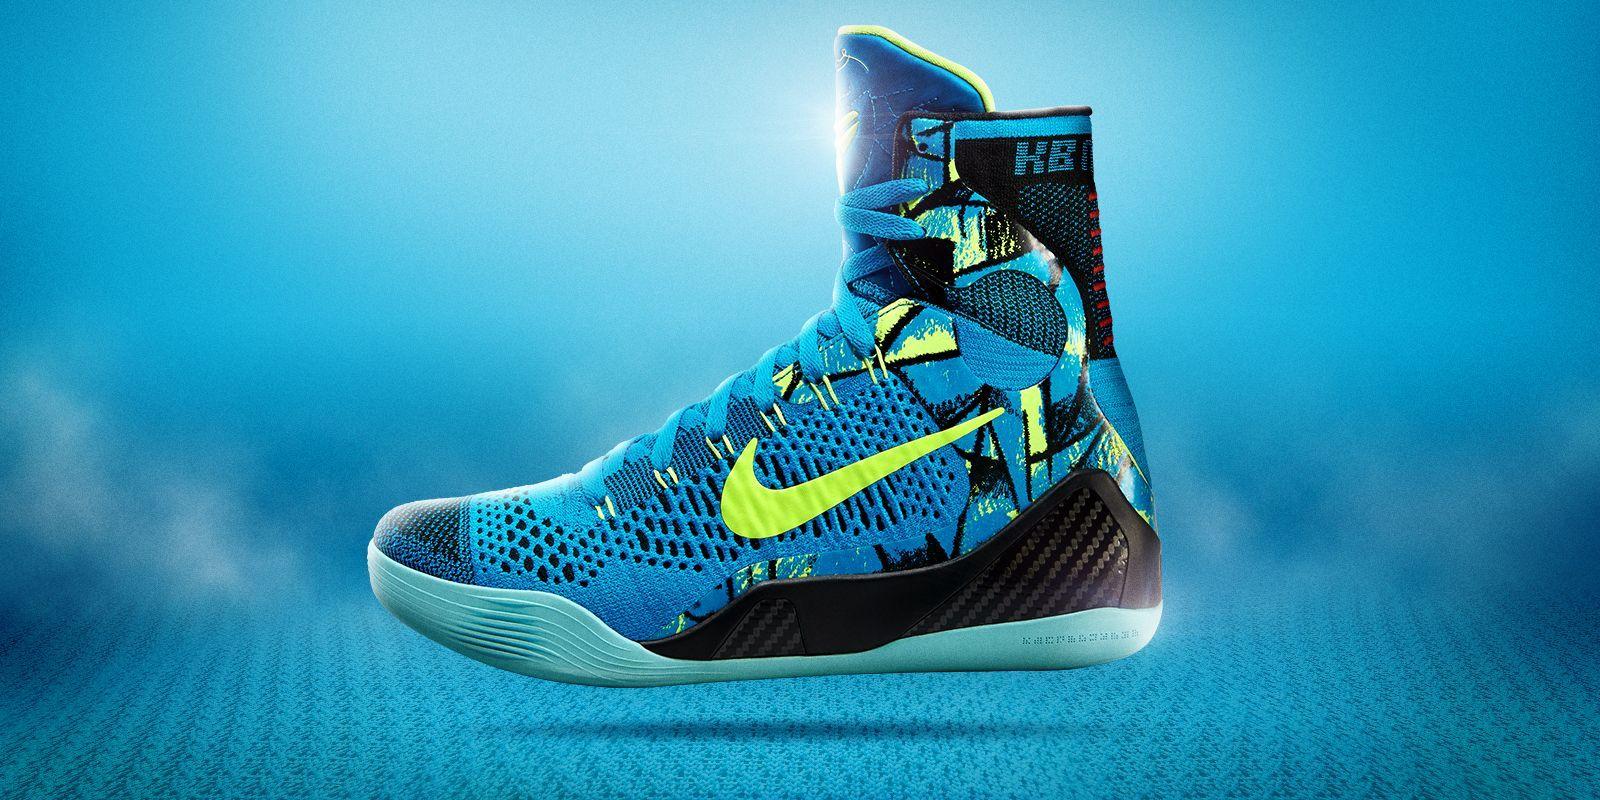 Sport Wallpaper Cheap Nike: Kobe Elite 9 / Colorways_03.jpg